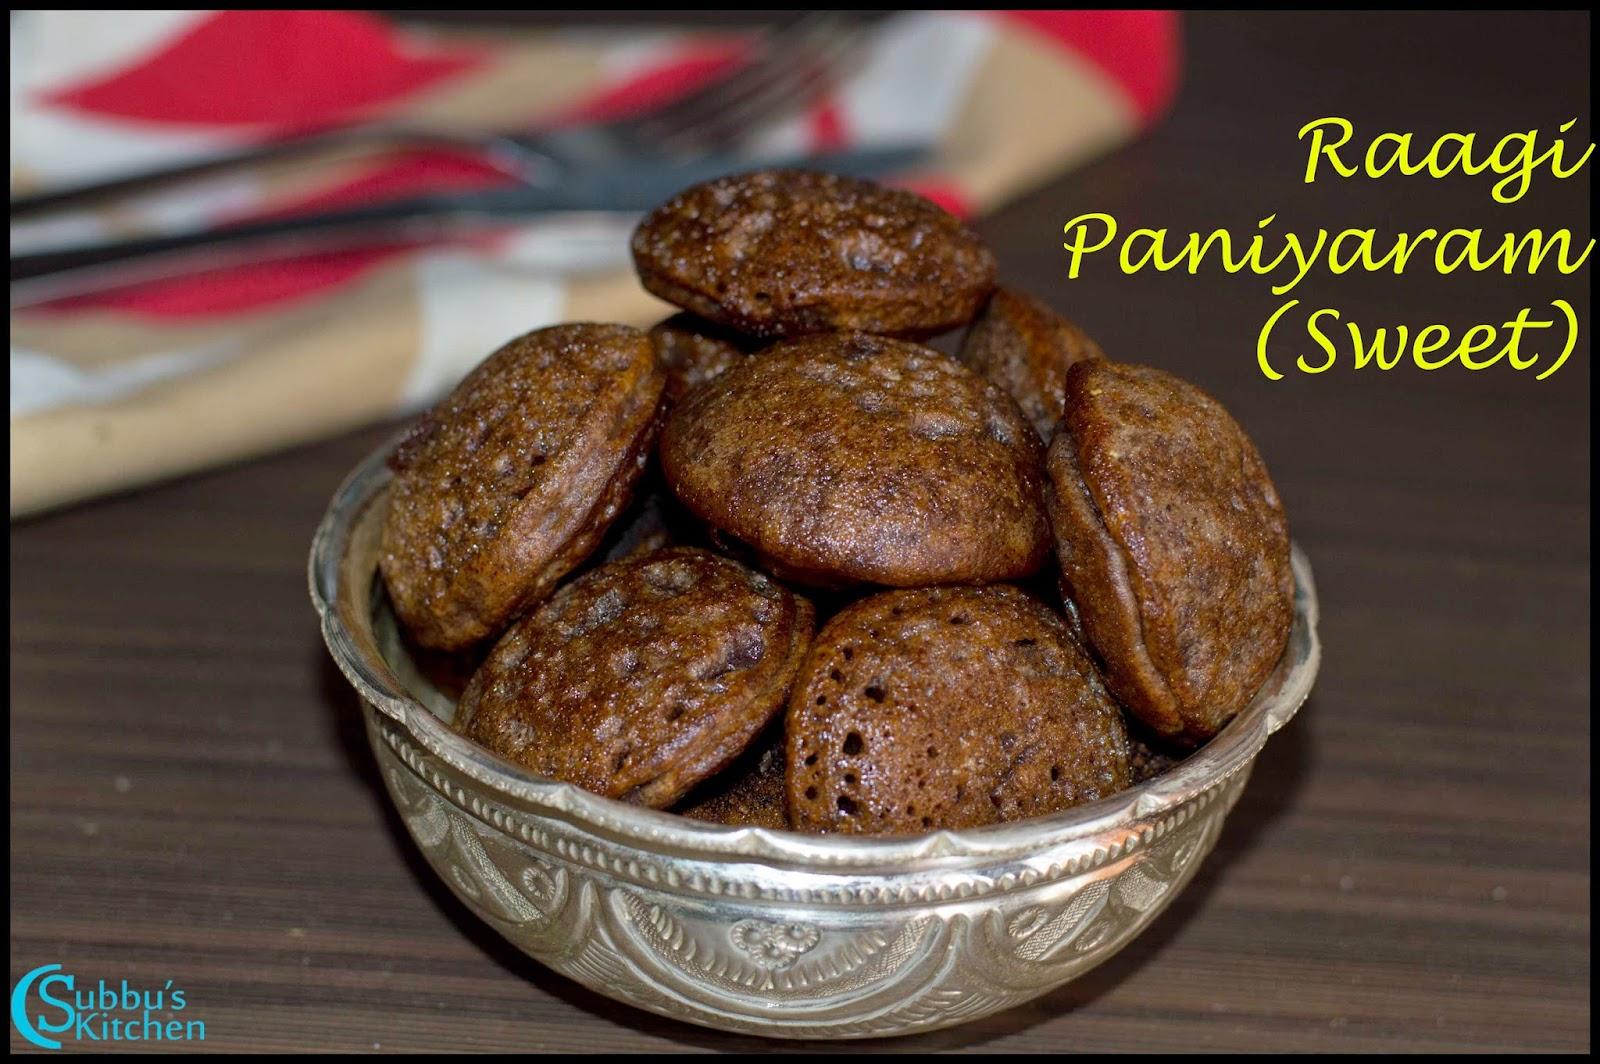 Raagi Flour Paniyaram (Sweet) Recipe | Instant Raagi Flour Sweet Paniyaram Recipe